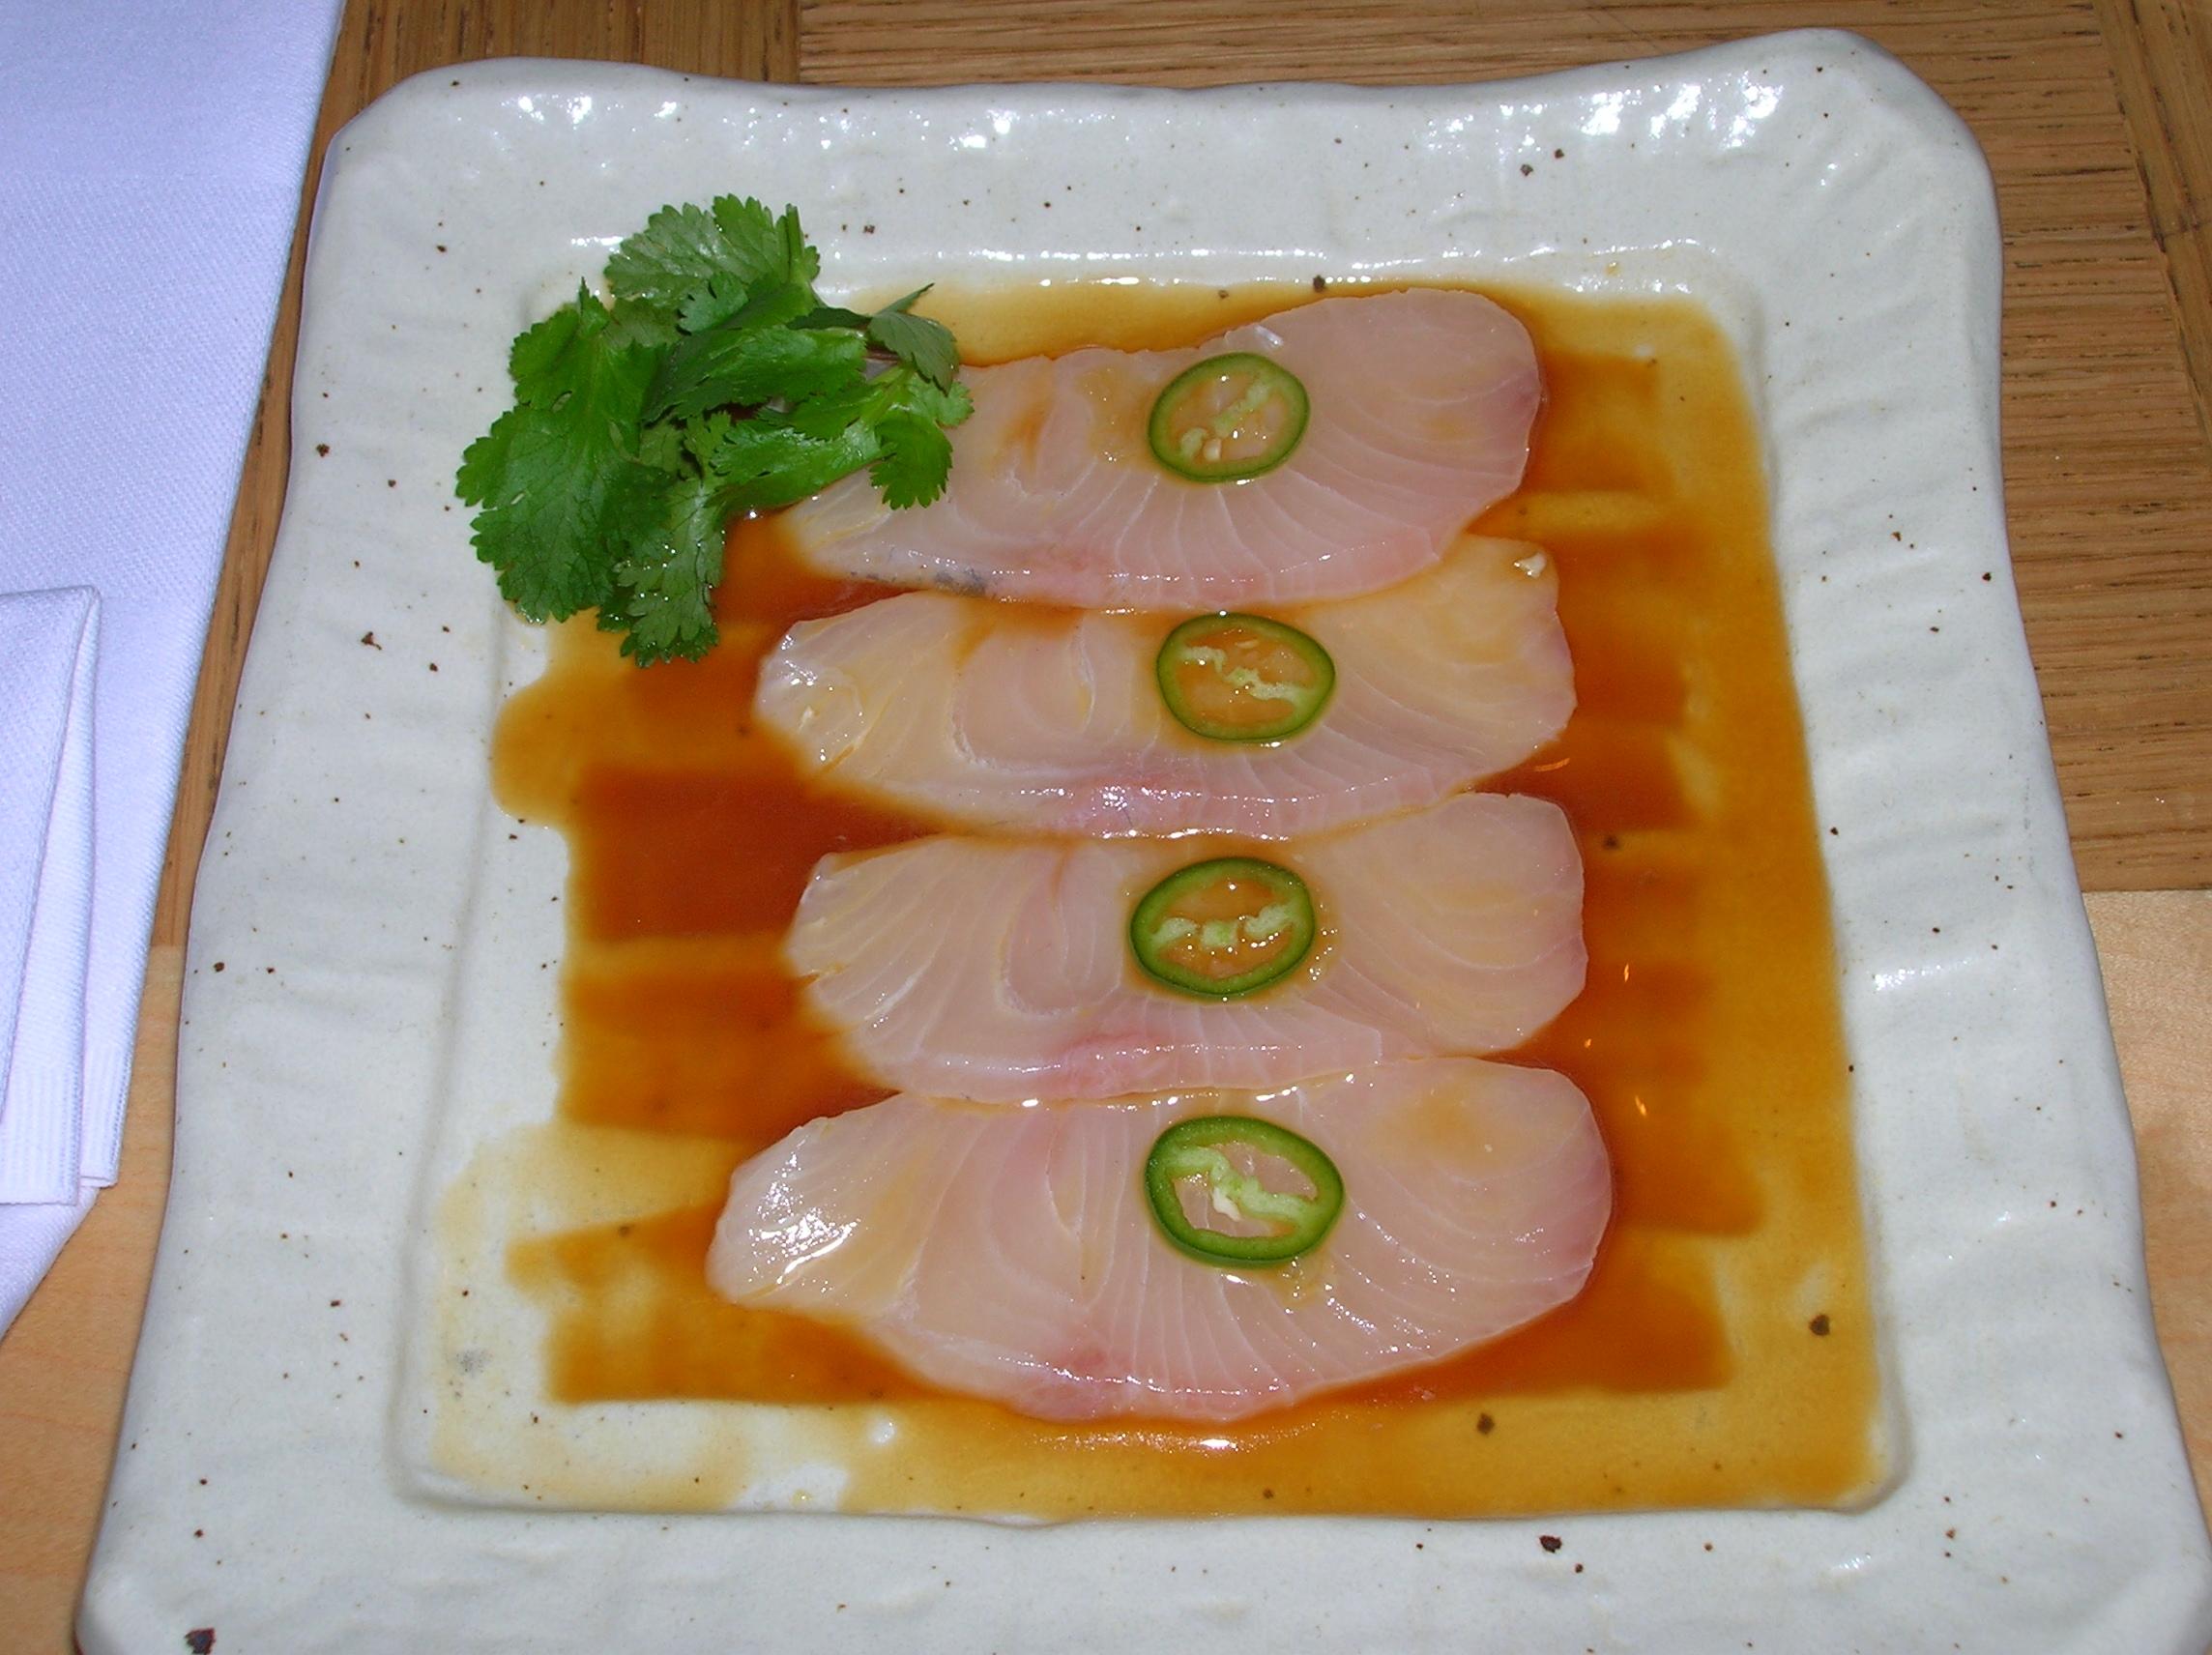 File:Yellowtail sashimi with Jalapeno.JPG - Wikimedia Commons